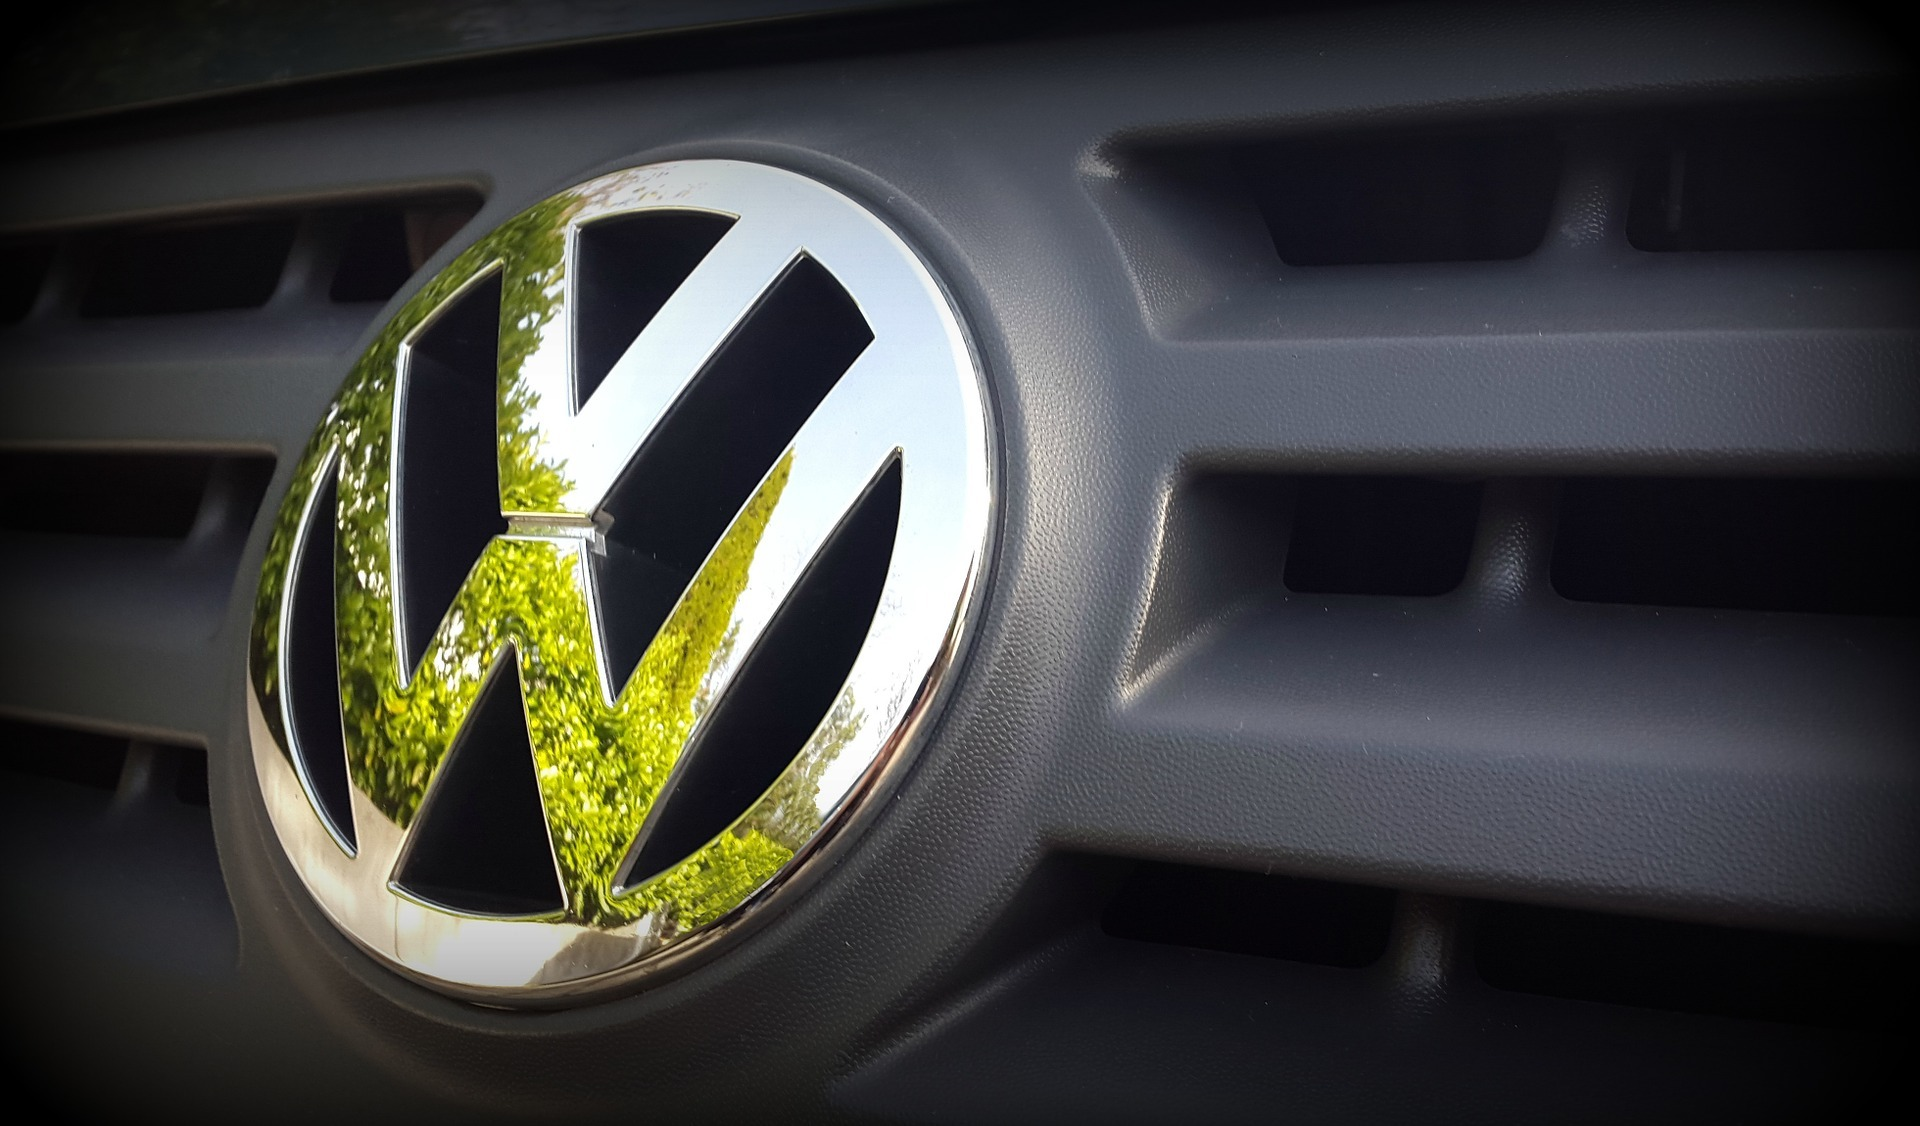 vw_volkswagen_auto_grill_marke_pkw_fahrzeug_autoindustrie